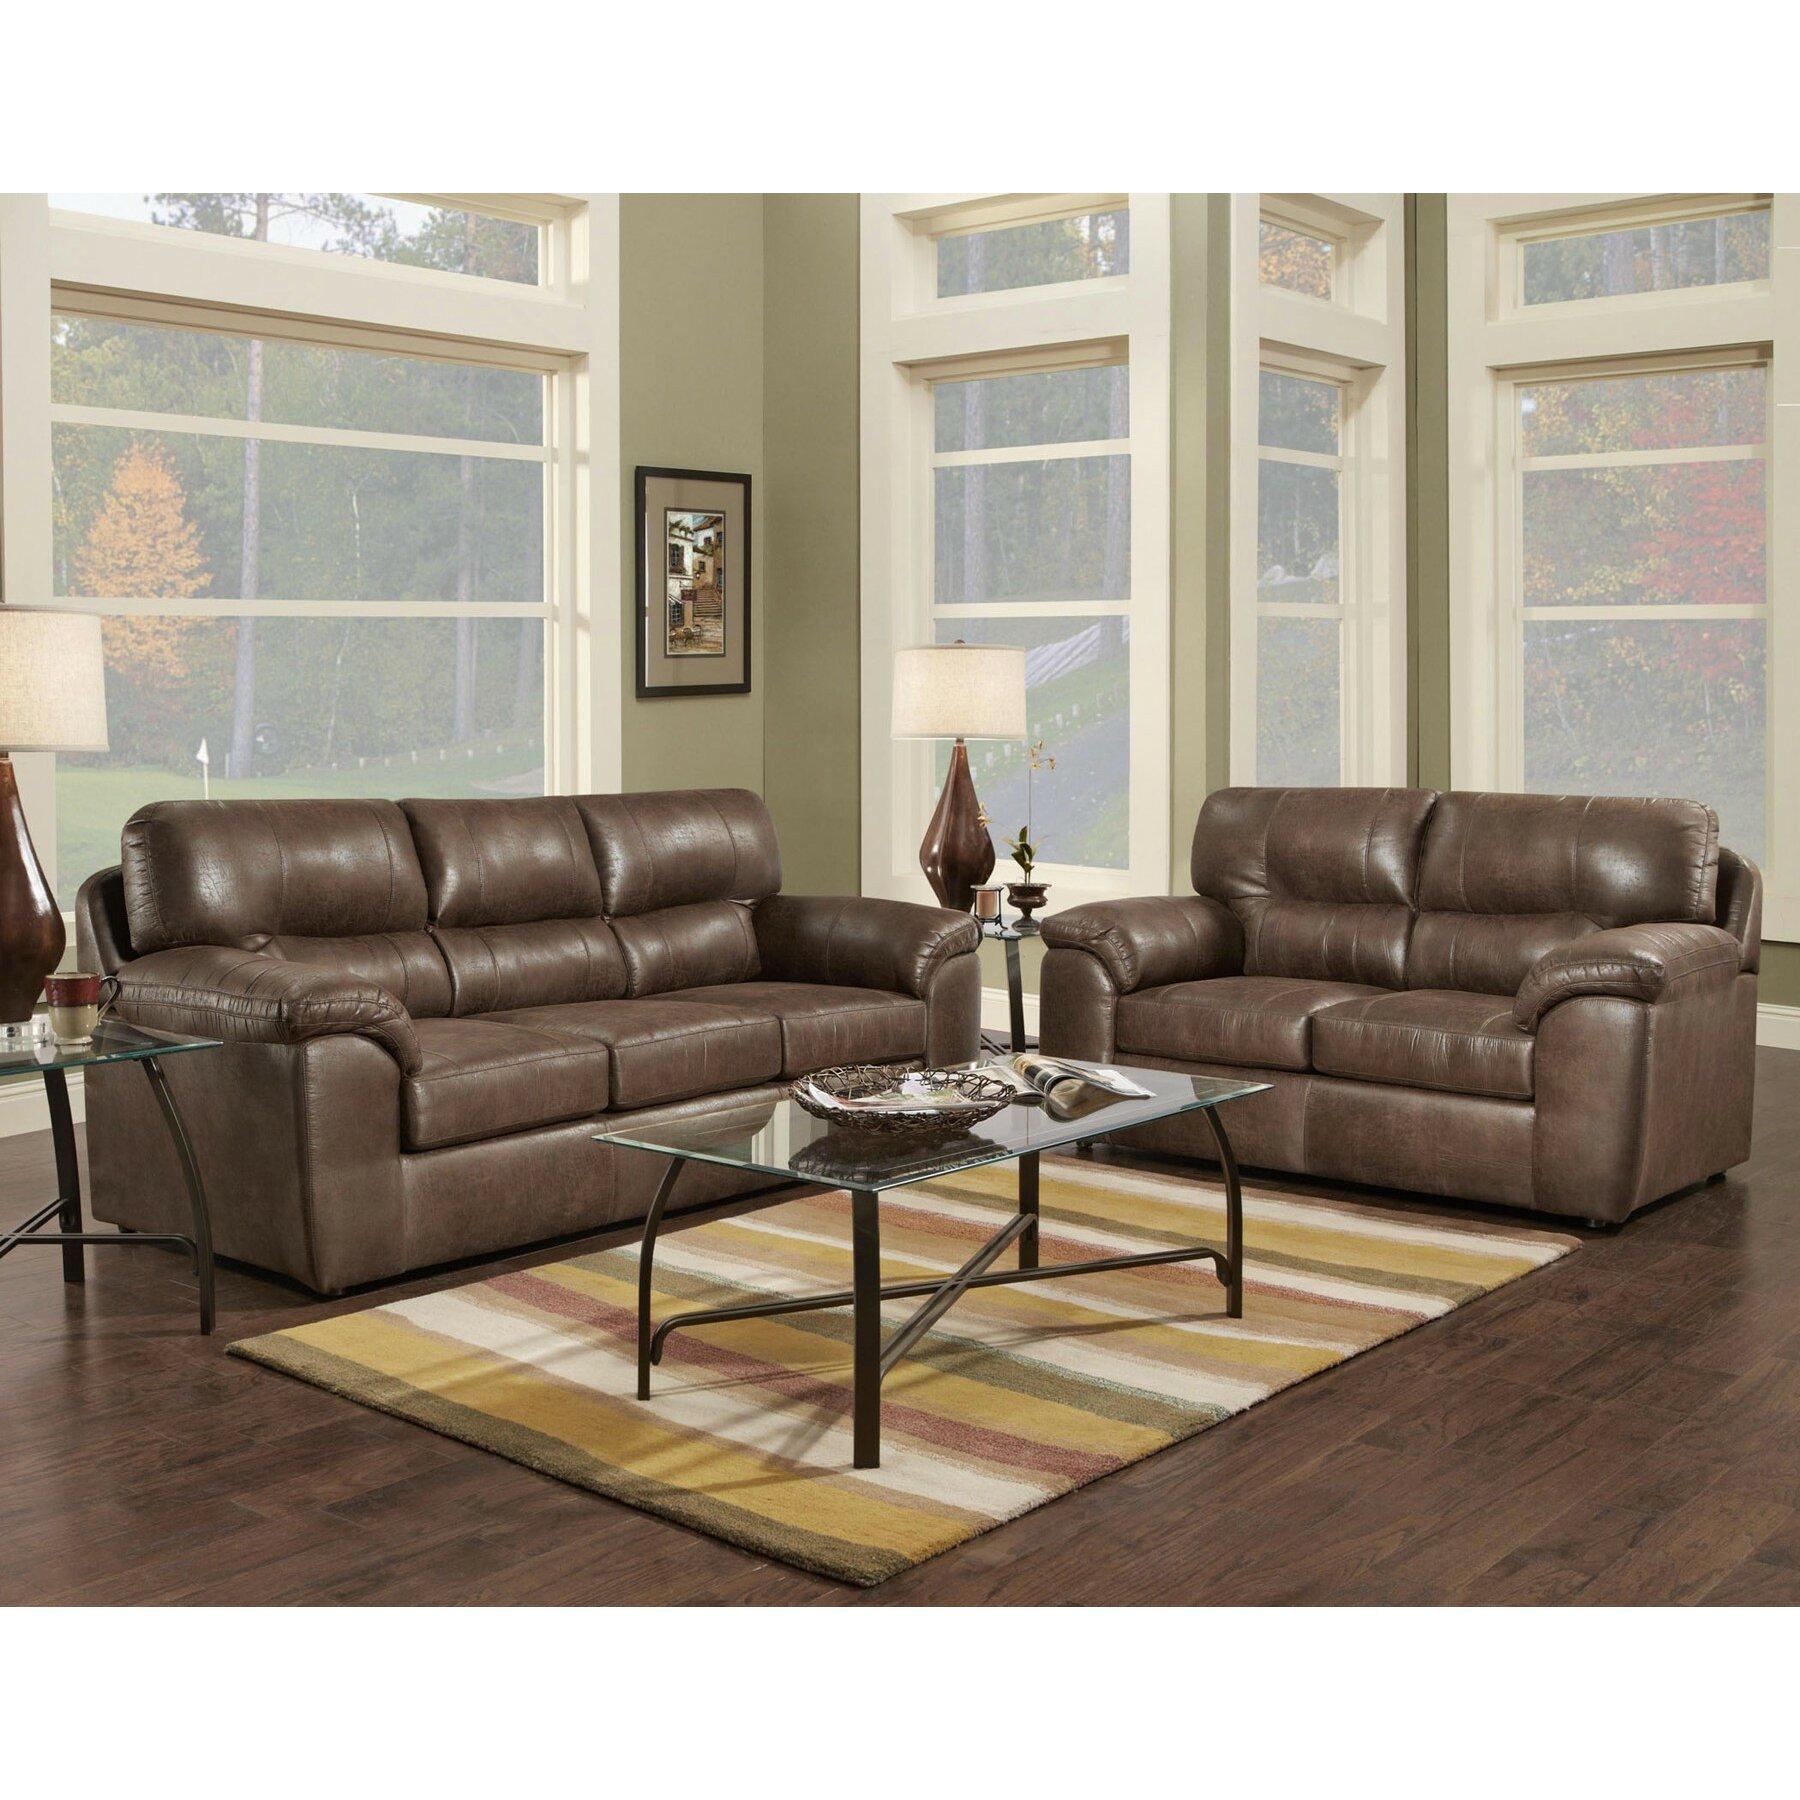 wildon home chance sleeper living room collection wayfair